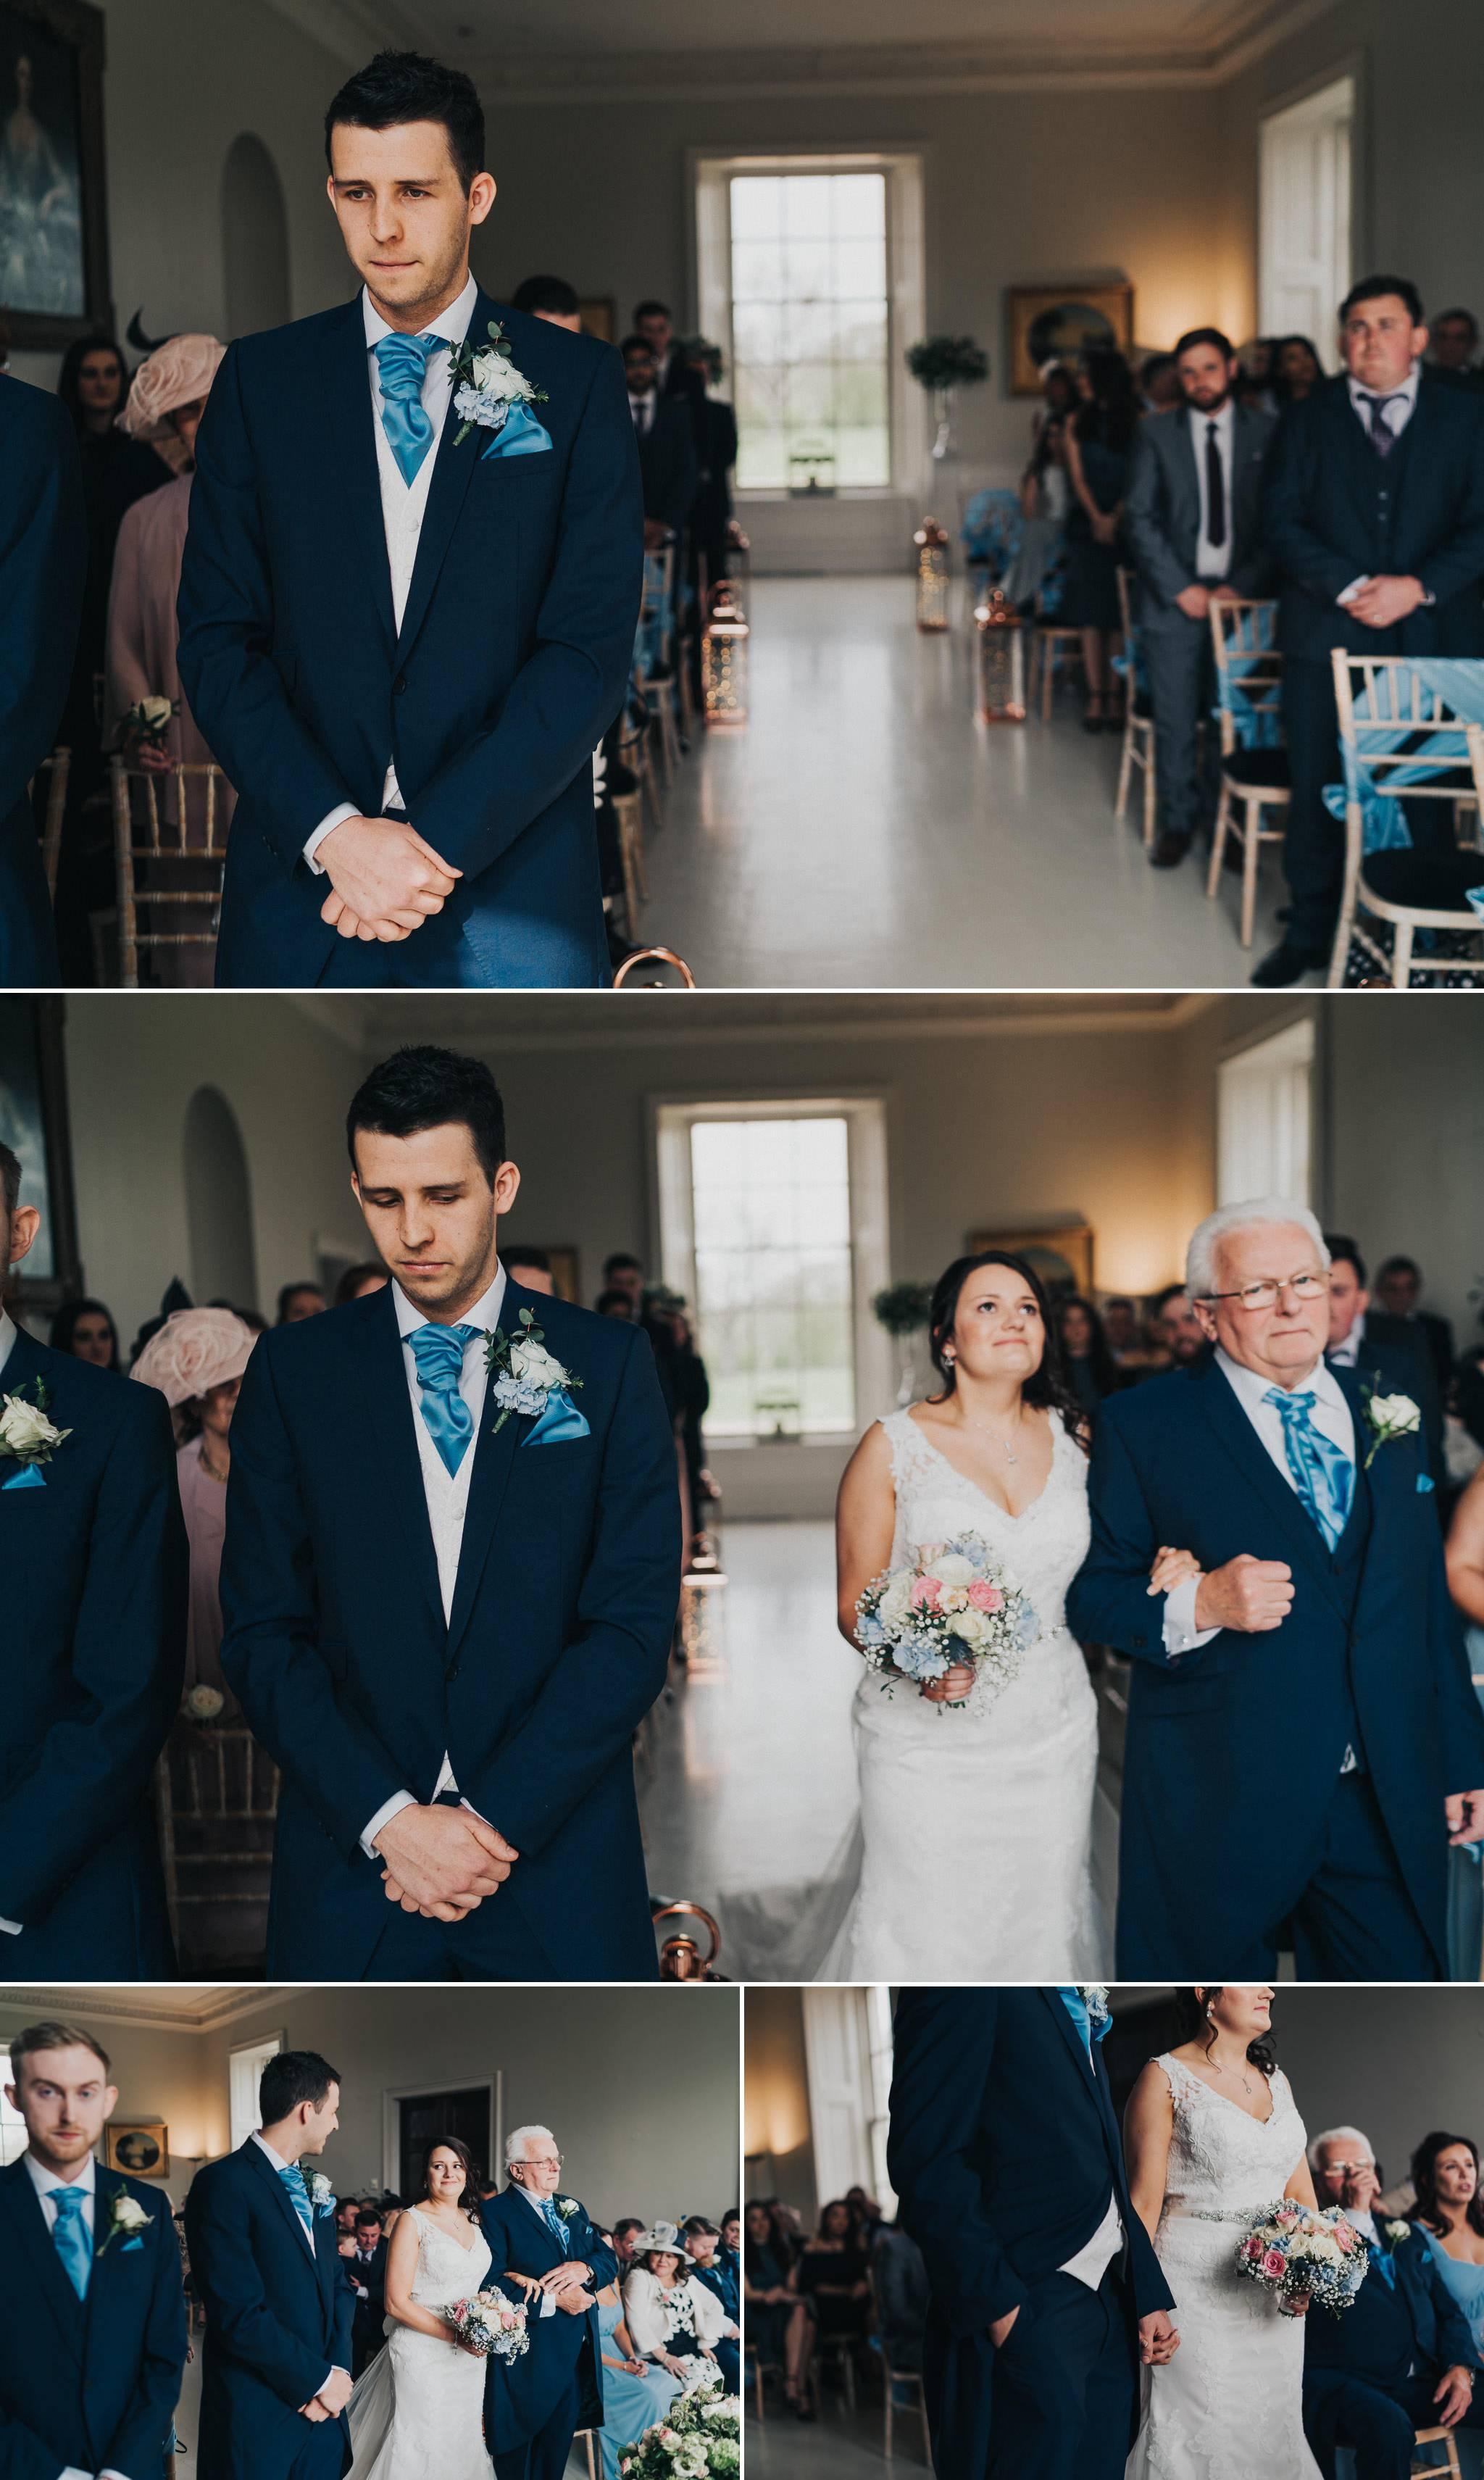 stubton-hall-wedding-photography 8.jpg